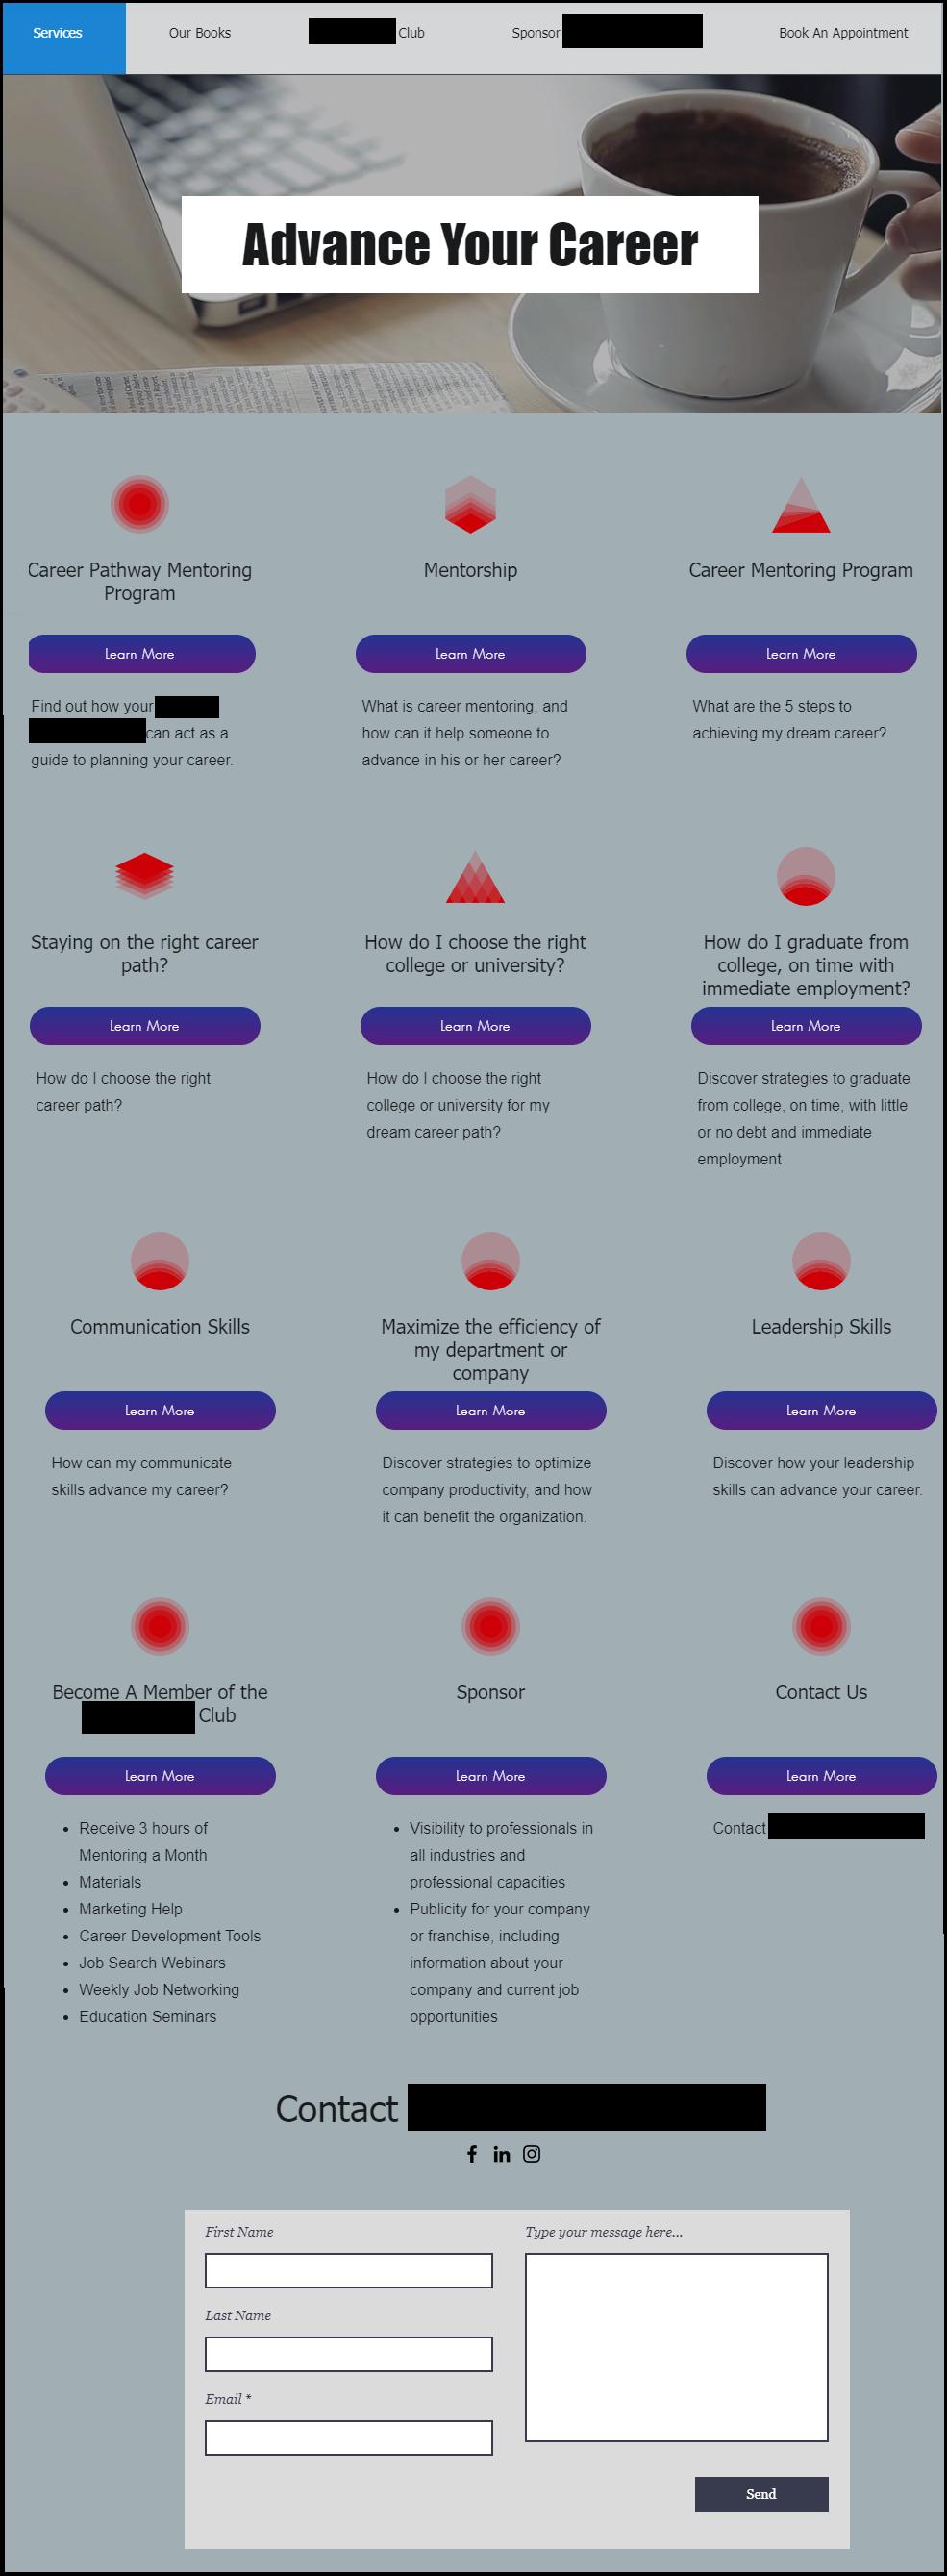 website screenshots - services (edited) 4.18.21